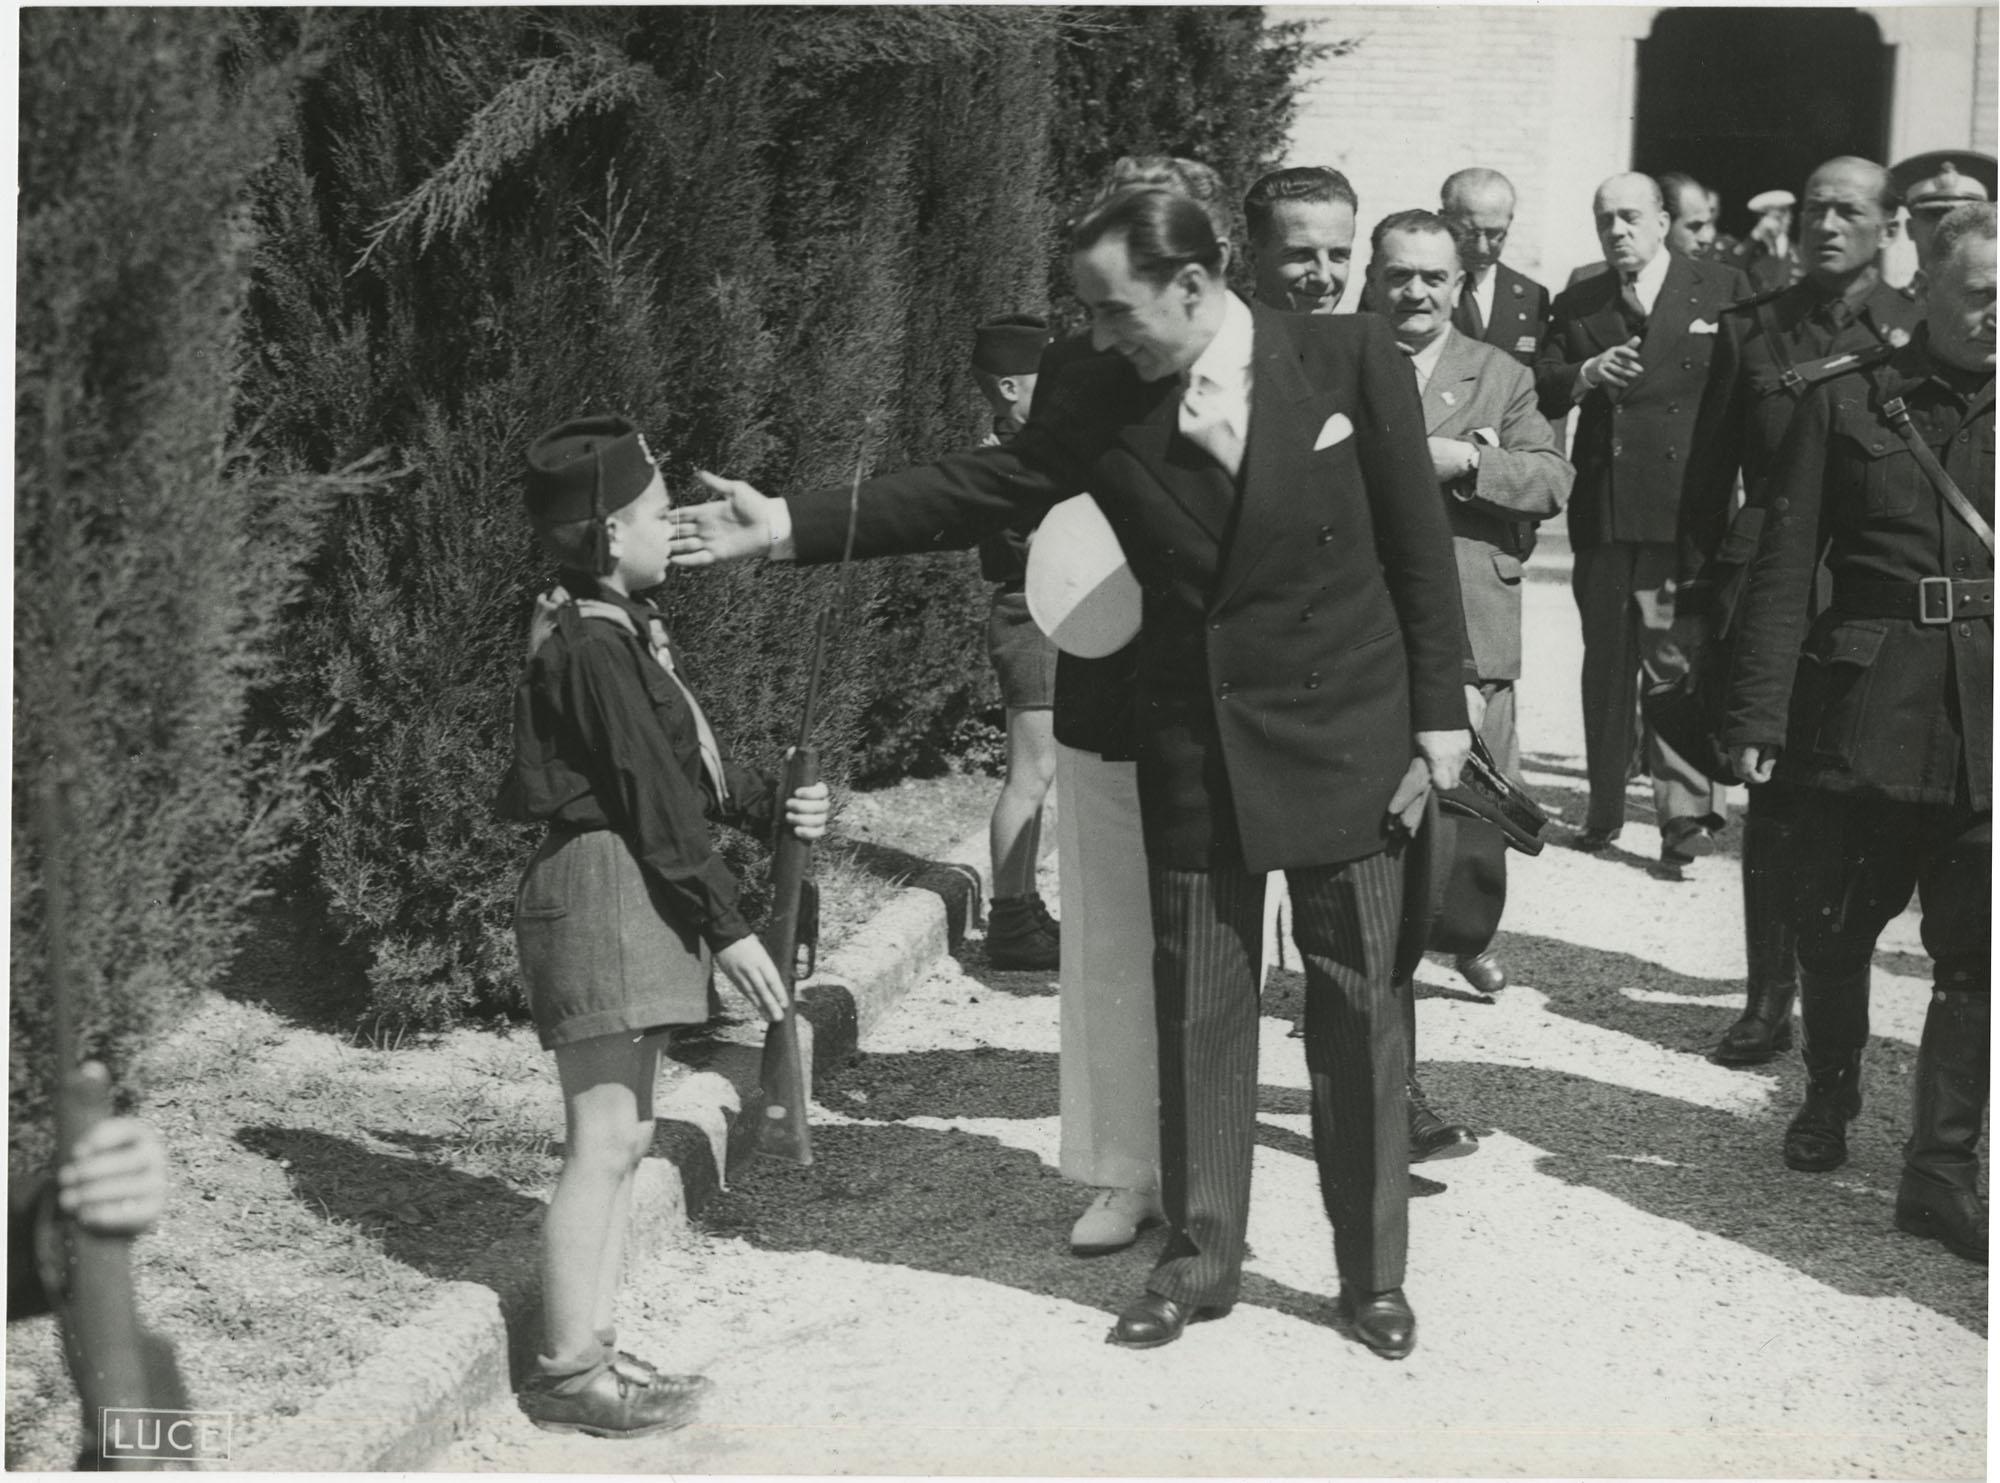 Mihai Antonescu's visit to Benito Mussolini, Photograph 13